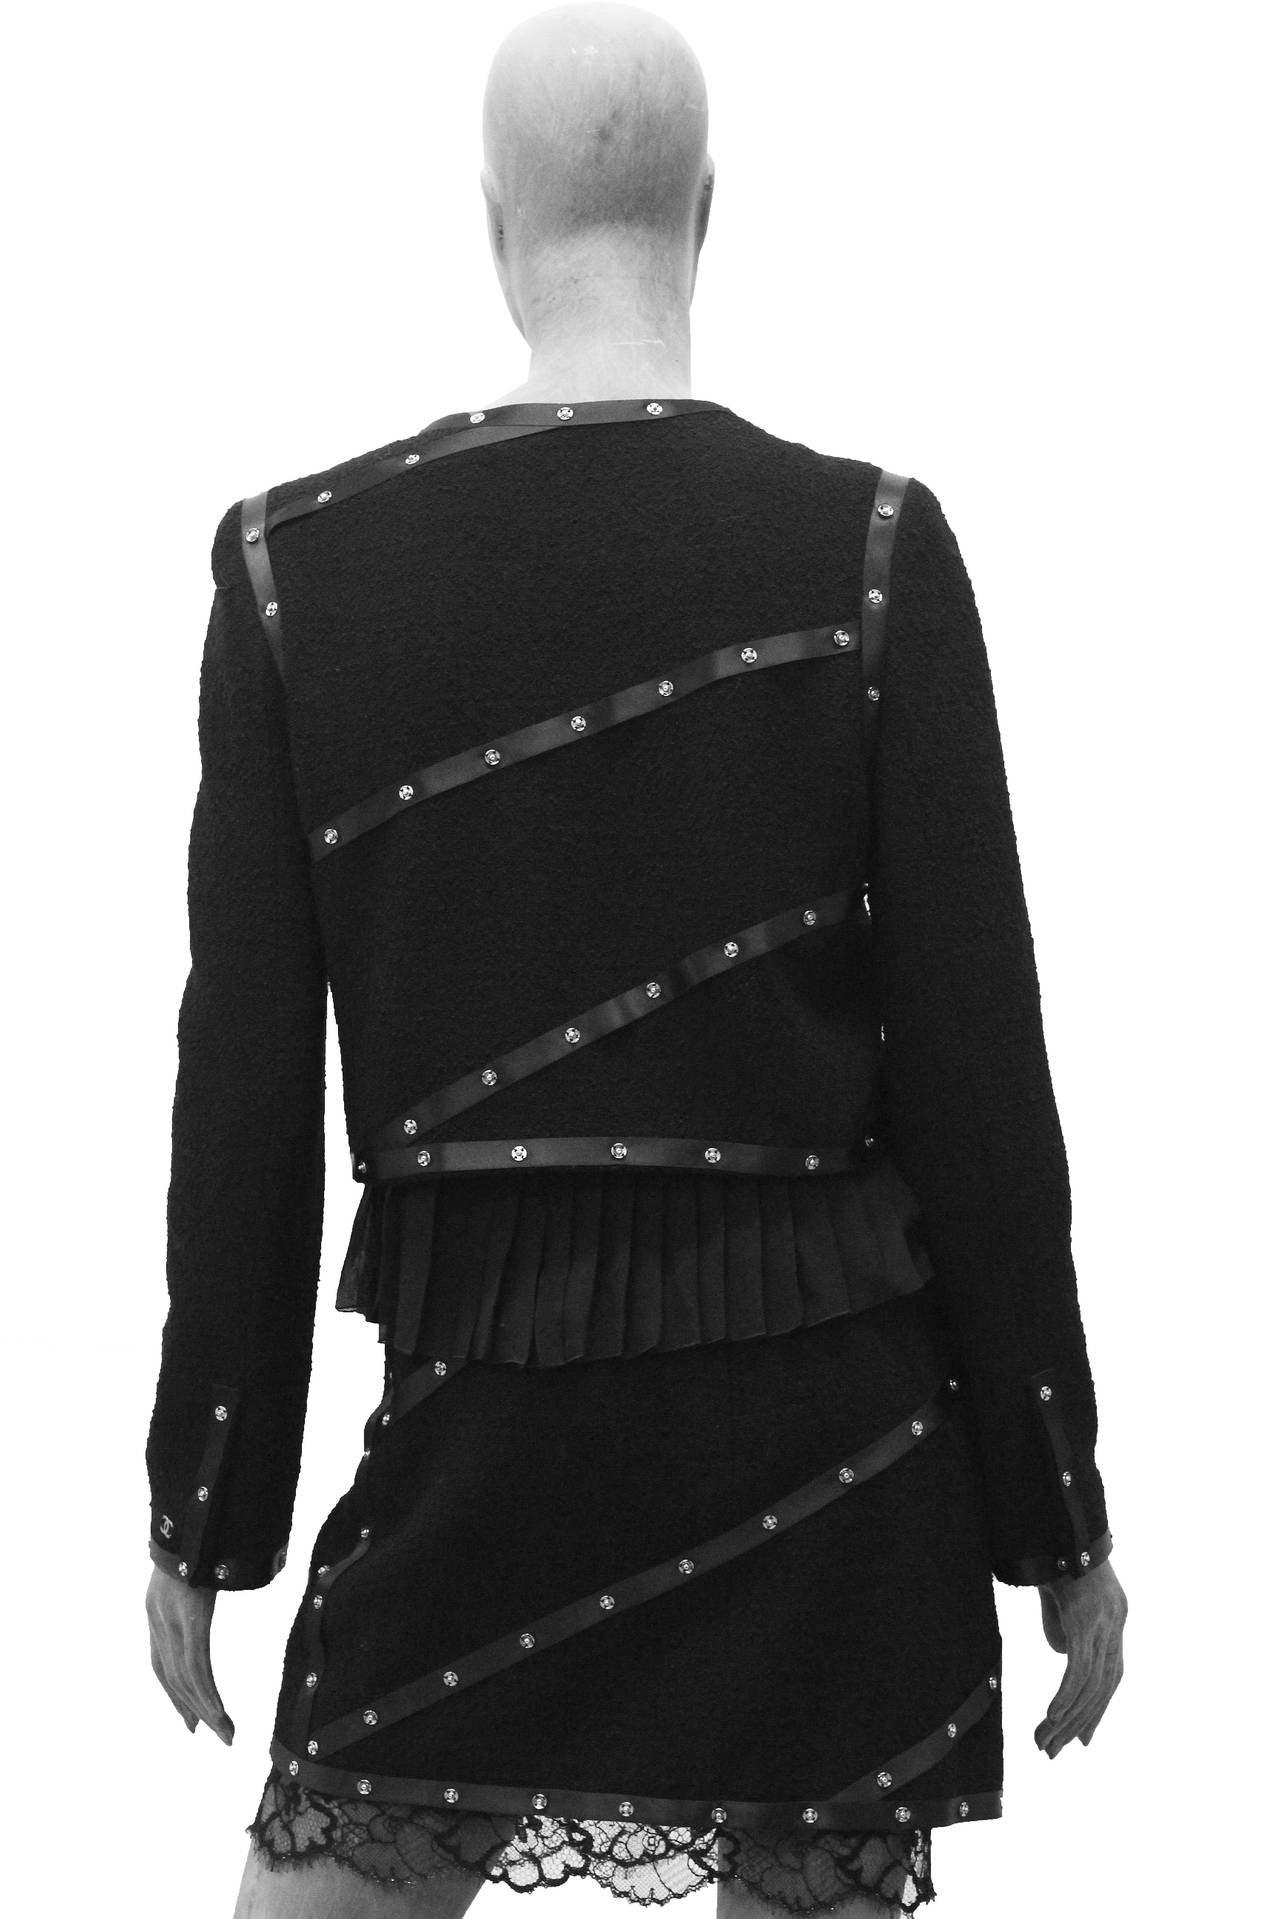 Campaign Chanel Studded Suit Ensemble CIRCA 2003 3